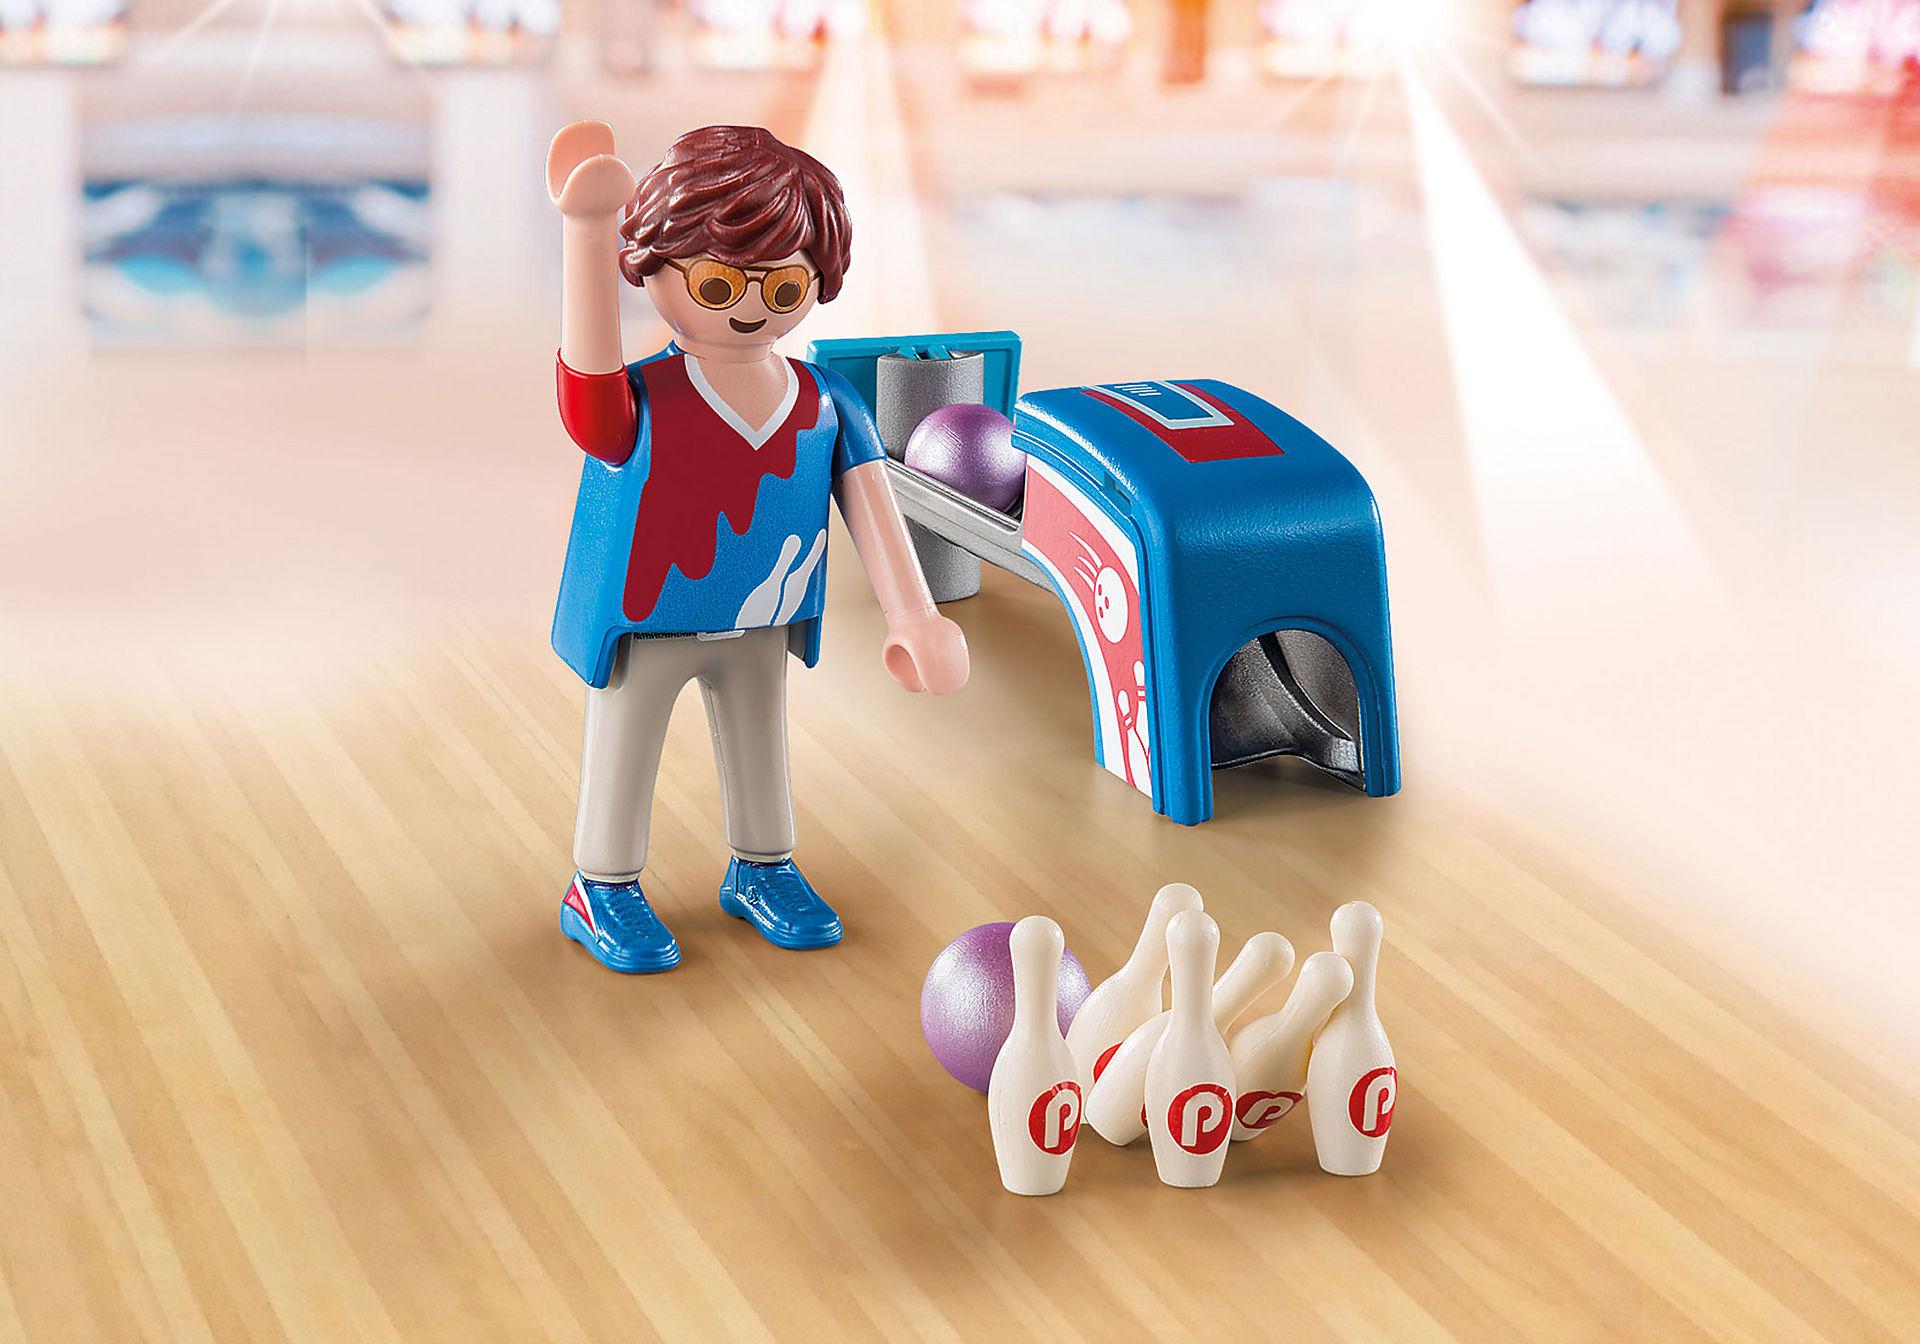 9440 Giocatore di bowling zoom image1